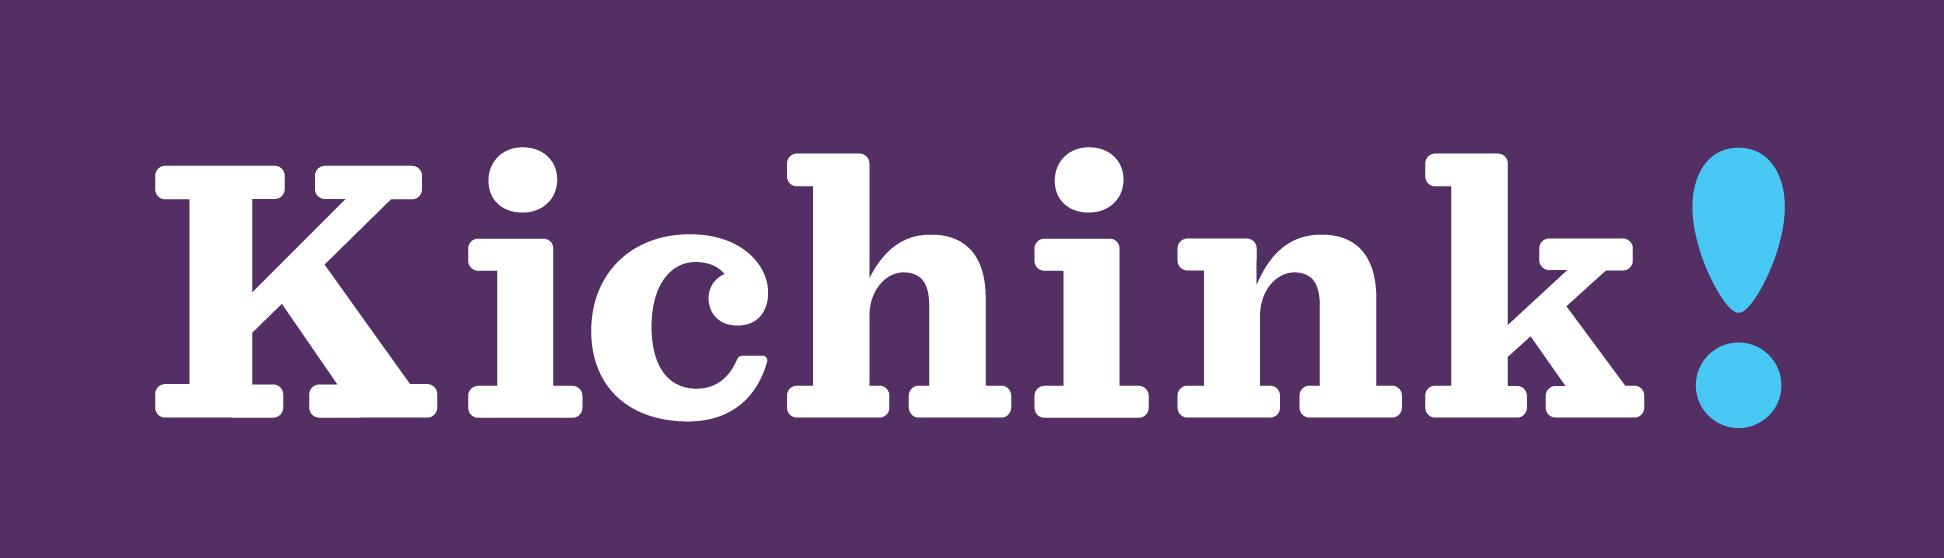 logo Kichink